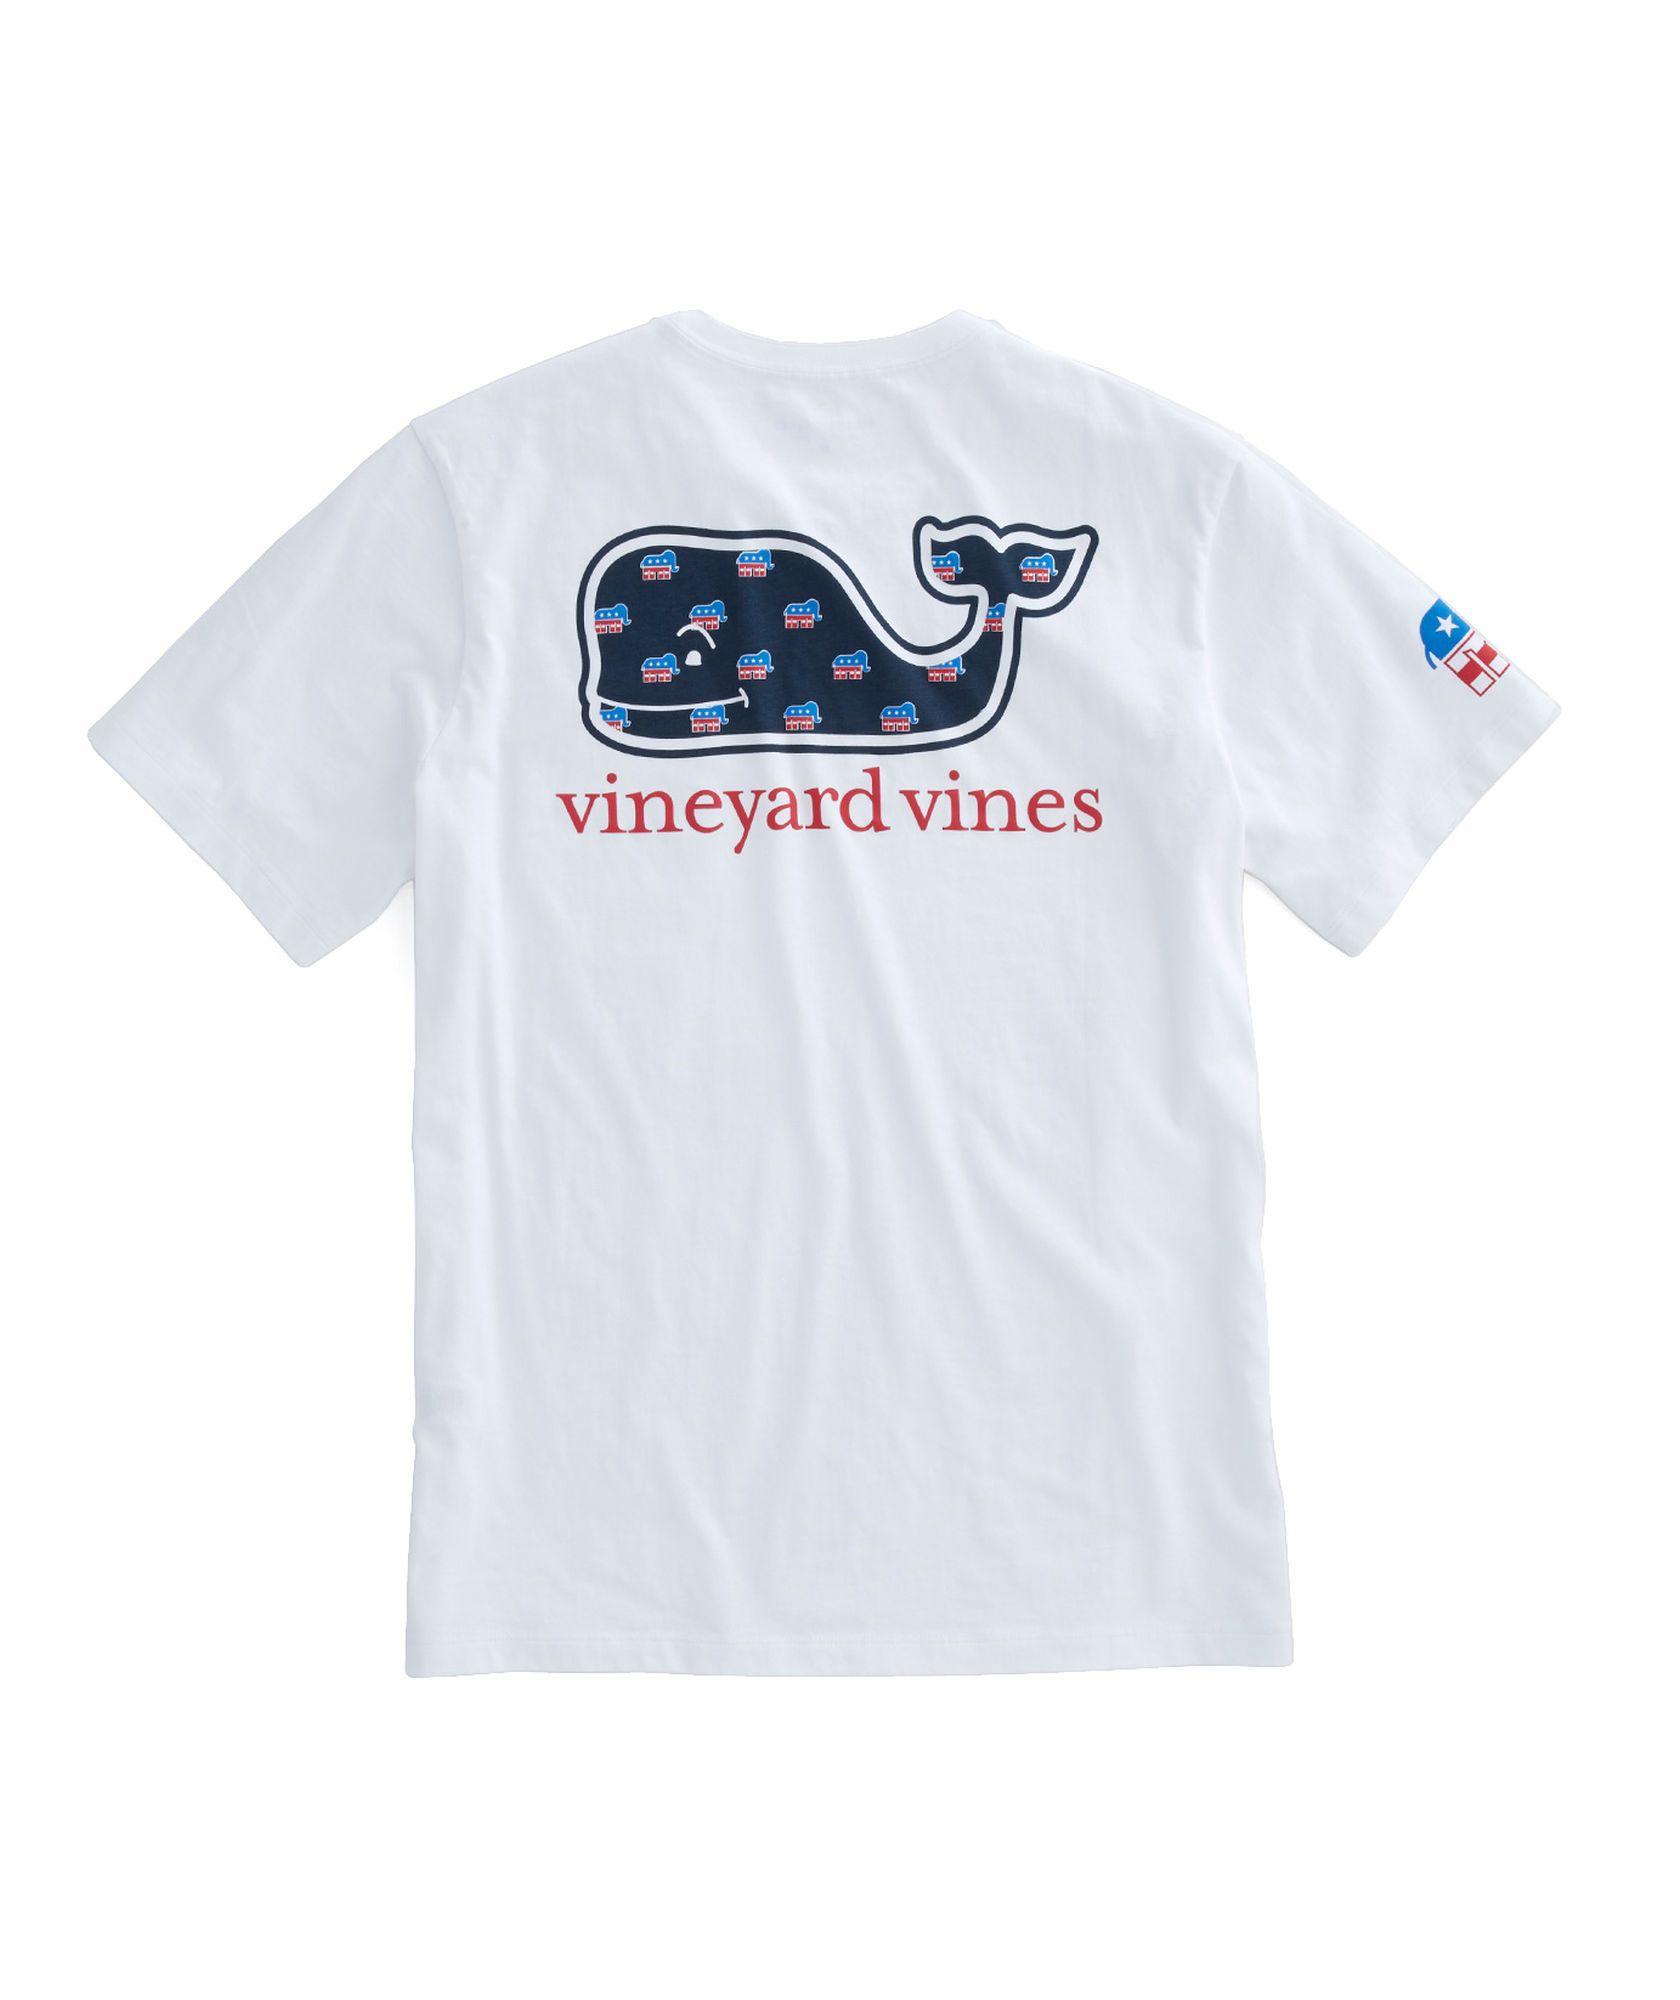 c6c176843 Republican Vineyard Vines Shirt